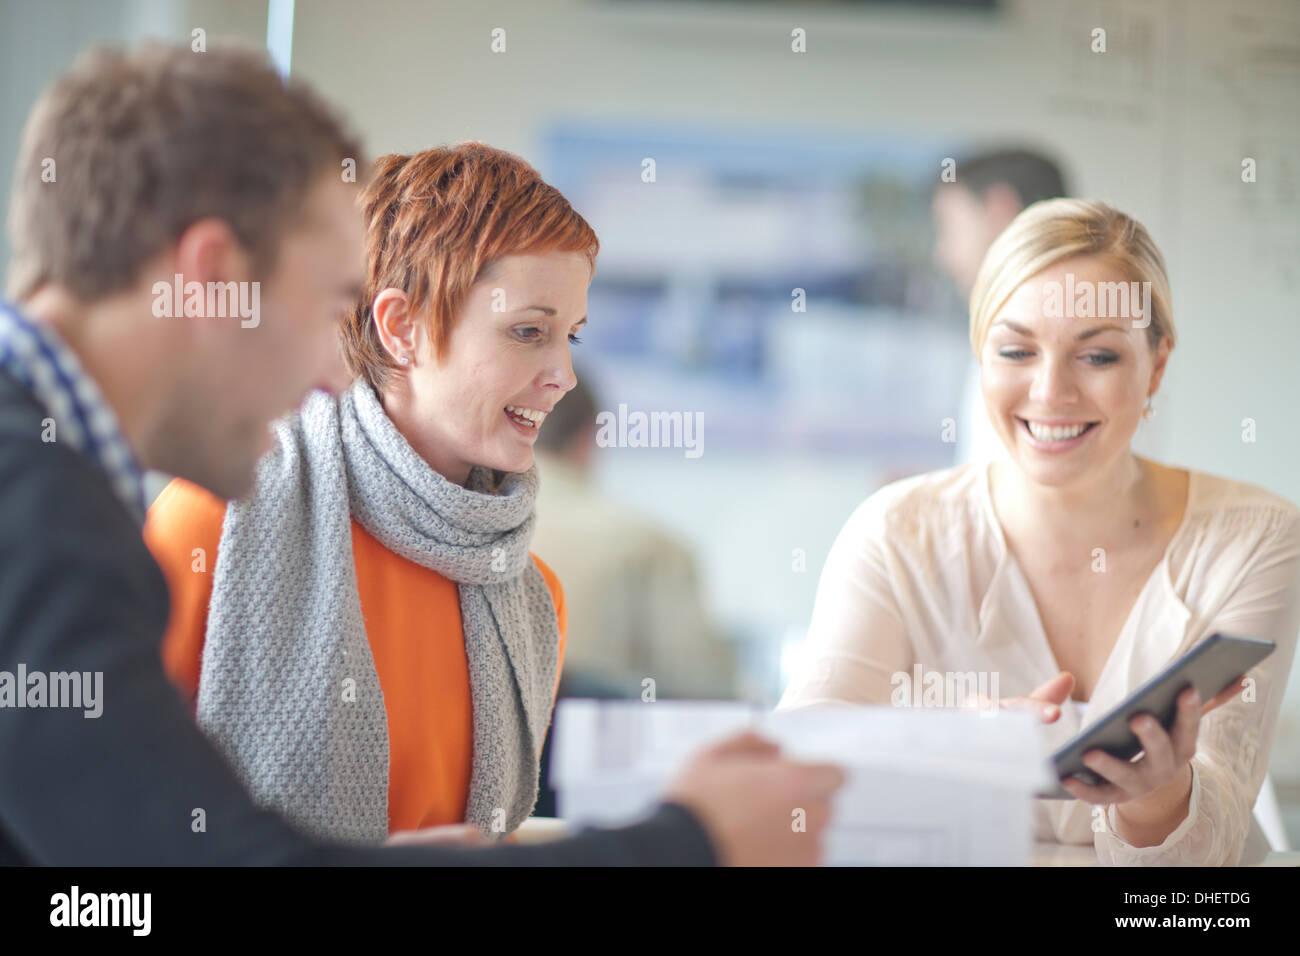 Geschäftsleute, Blick auf digital-Tablette Stockbild